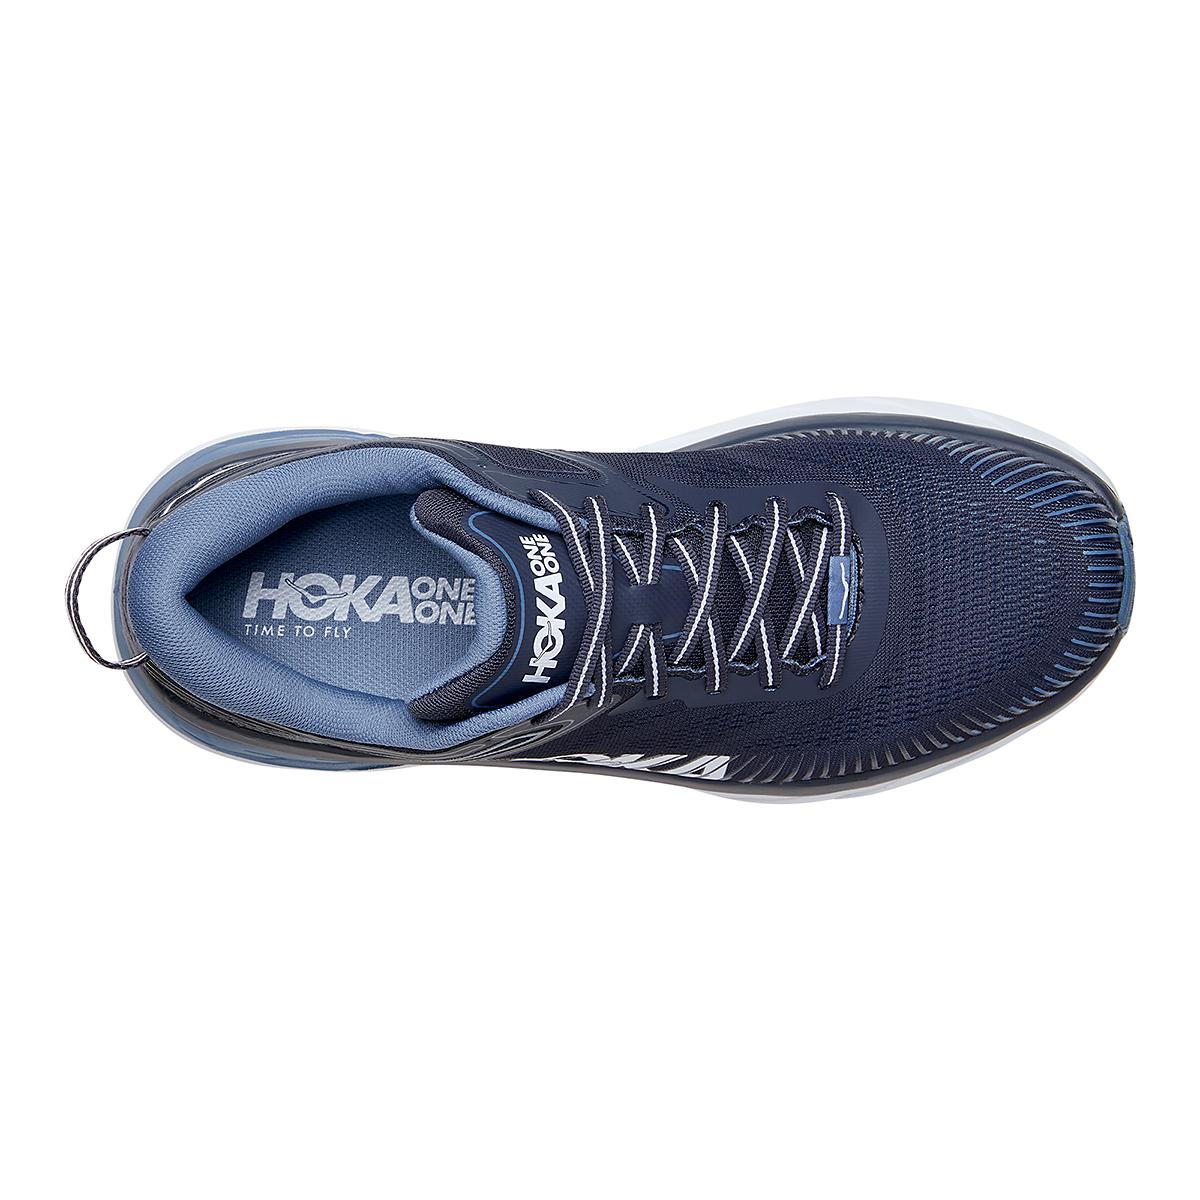 Men's Hoka One One Bondi 7 Running Shoe - Color: Ombre Blue/Provincial Blue - Size: 7 - Width: Regular, Ombre Blue/Provincial Blue, large, image 5